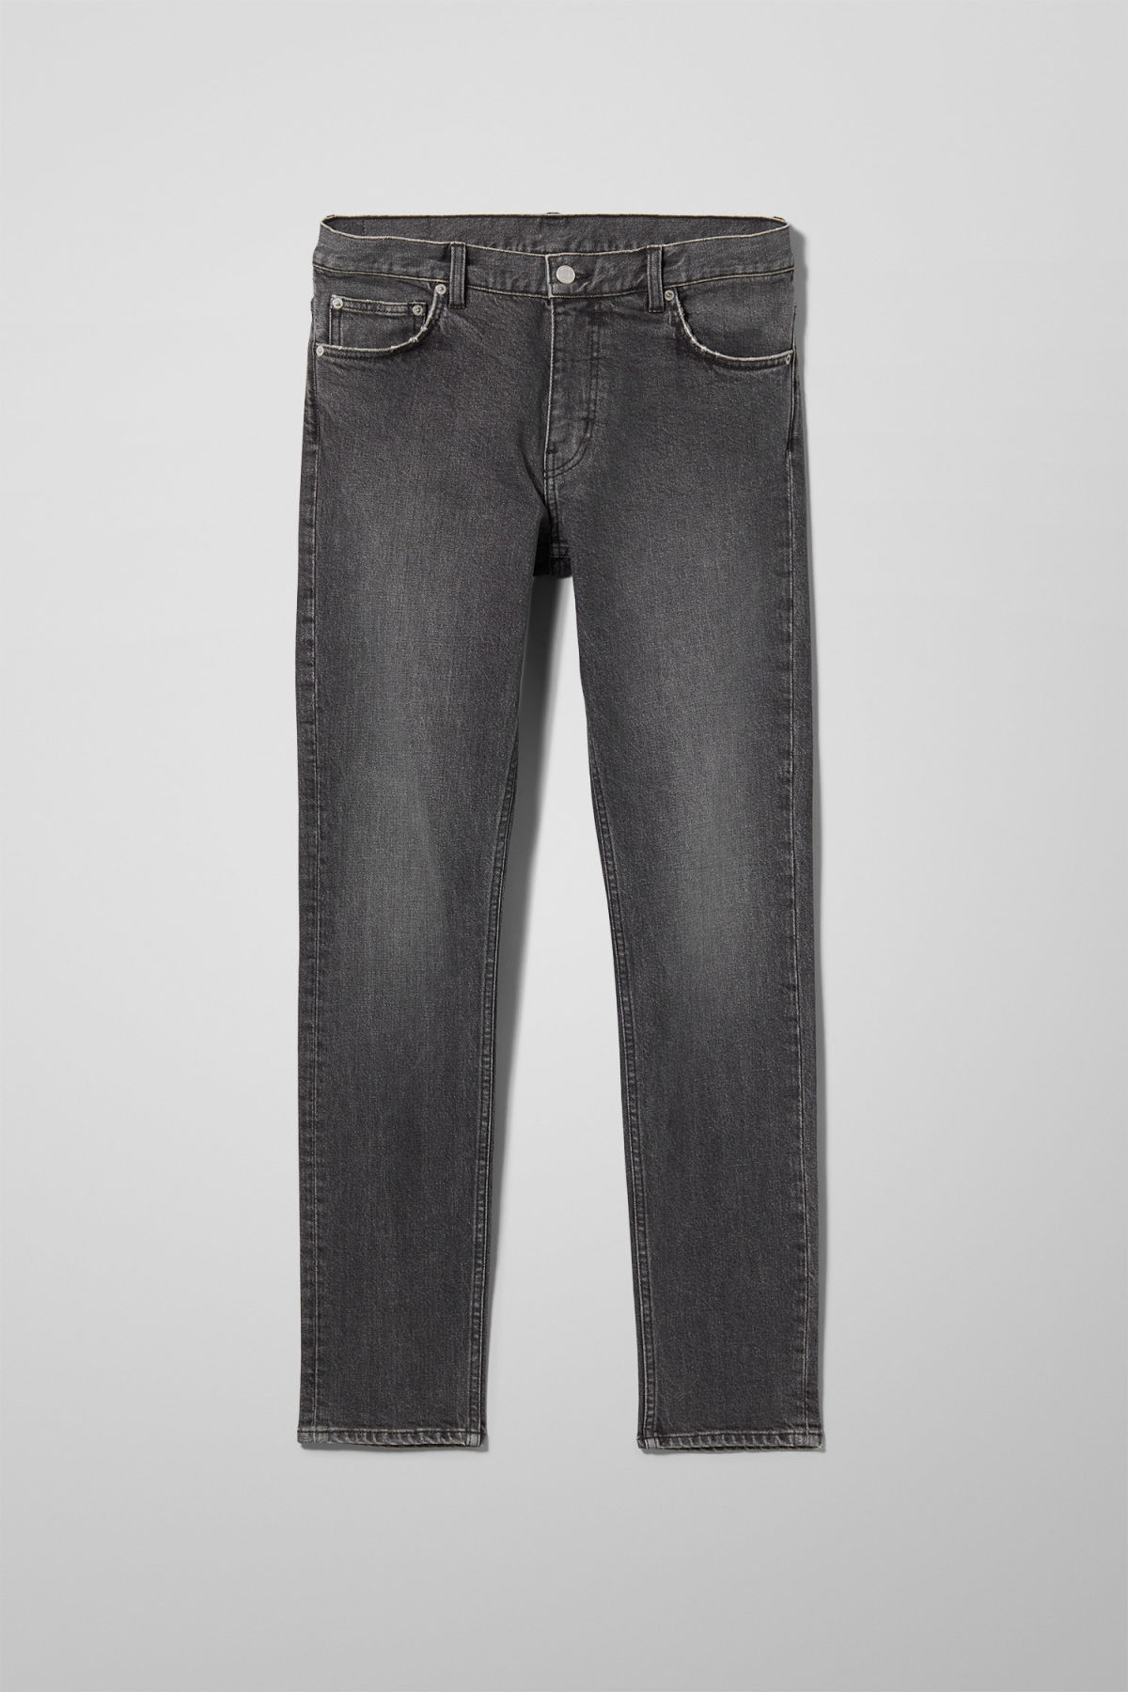 Friday Slim Jeans - Grey